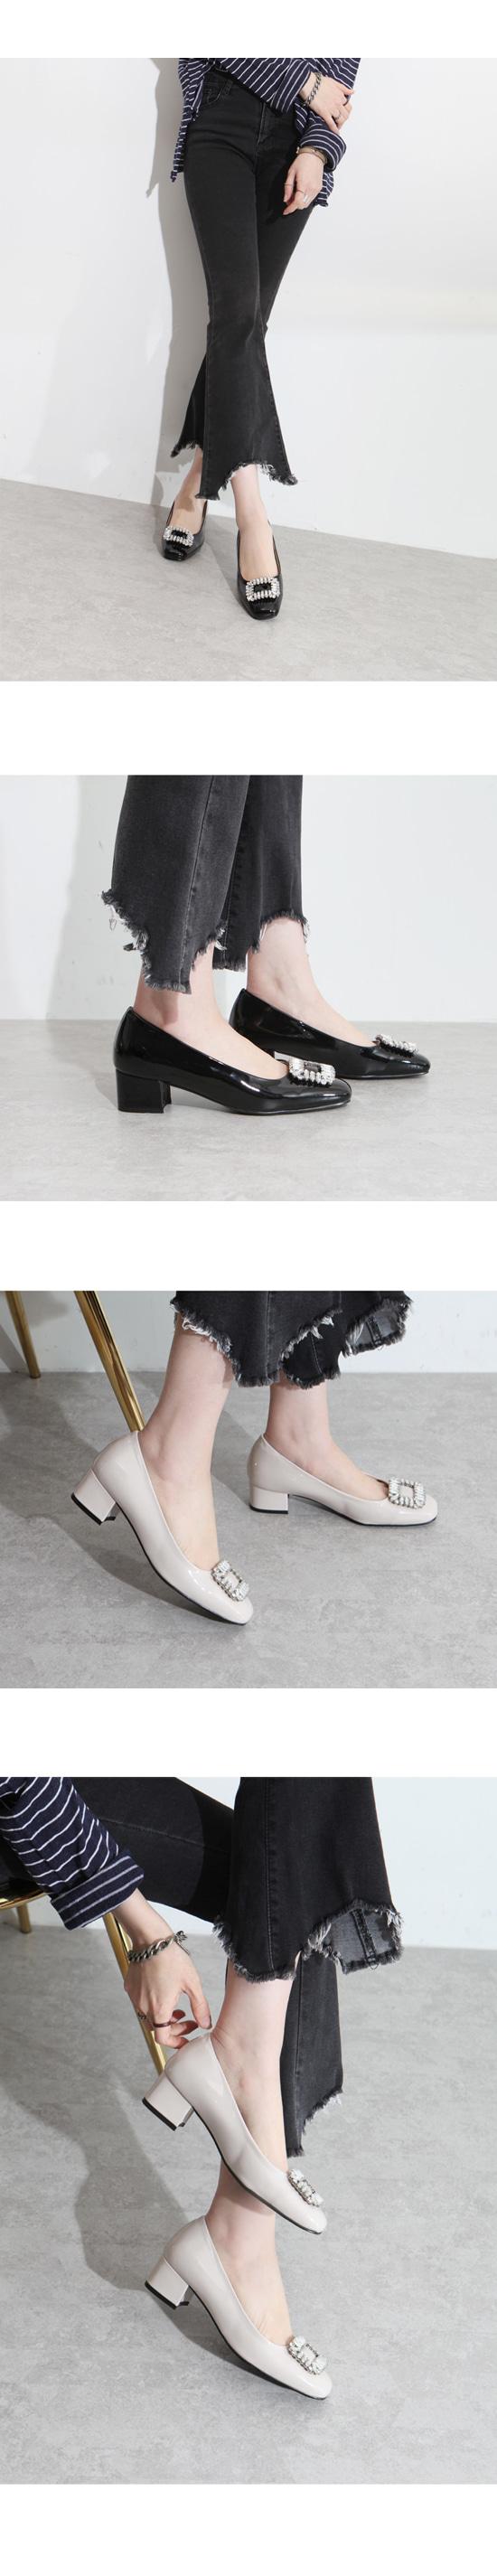 Cubic Luxury Enamel Middle Heel 4cm Black